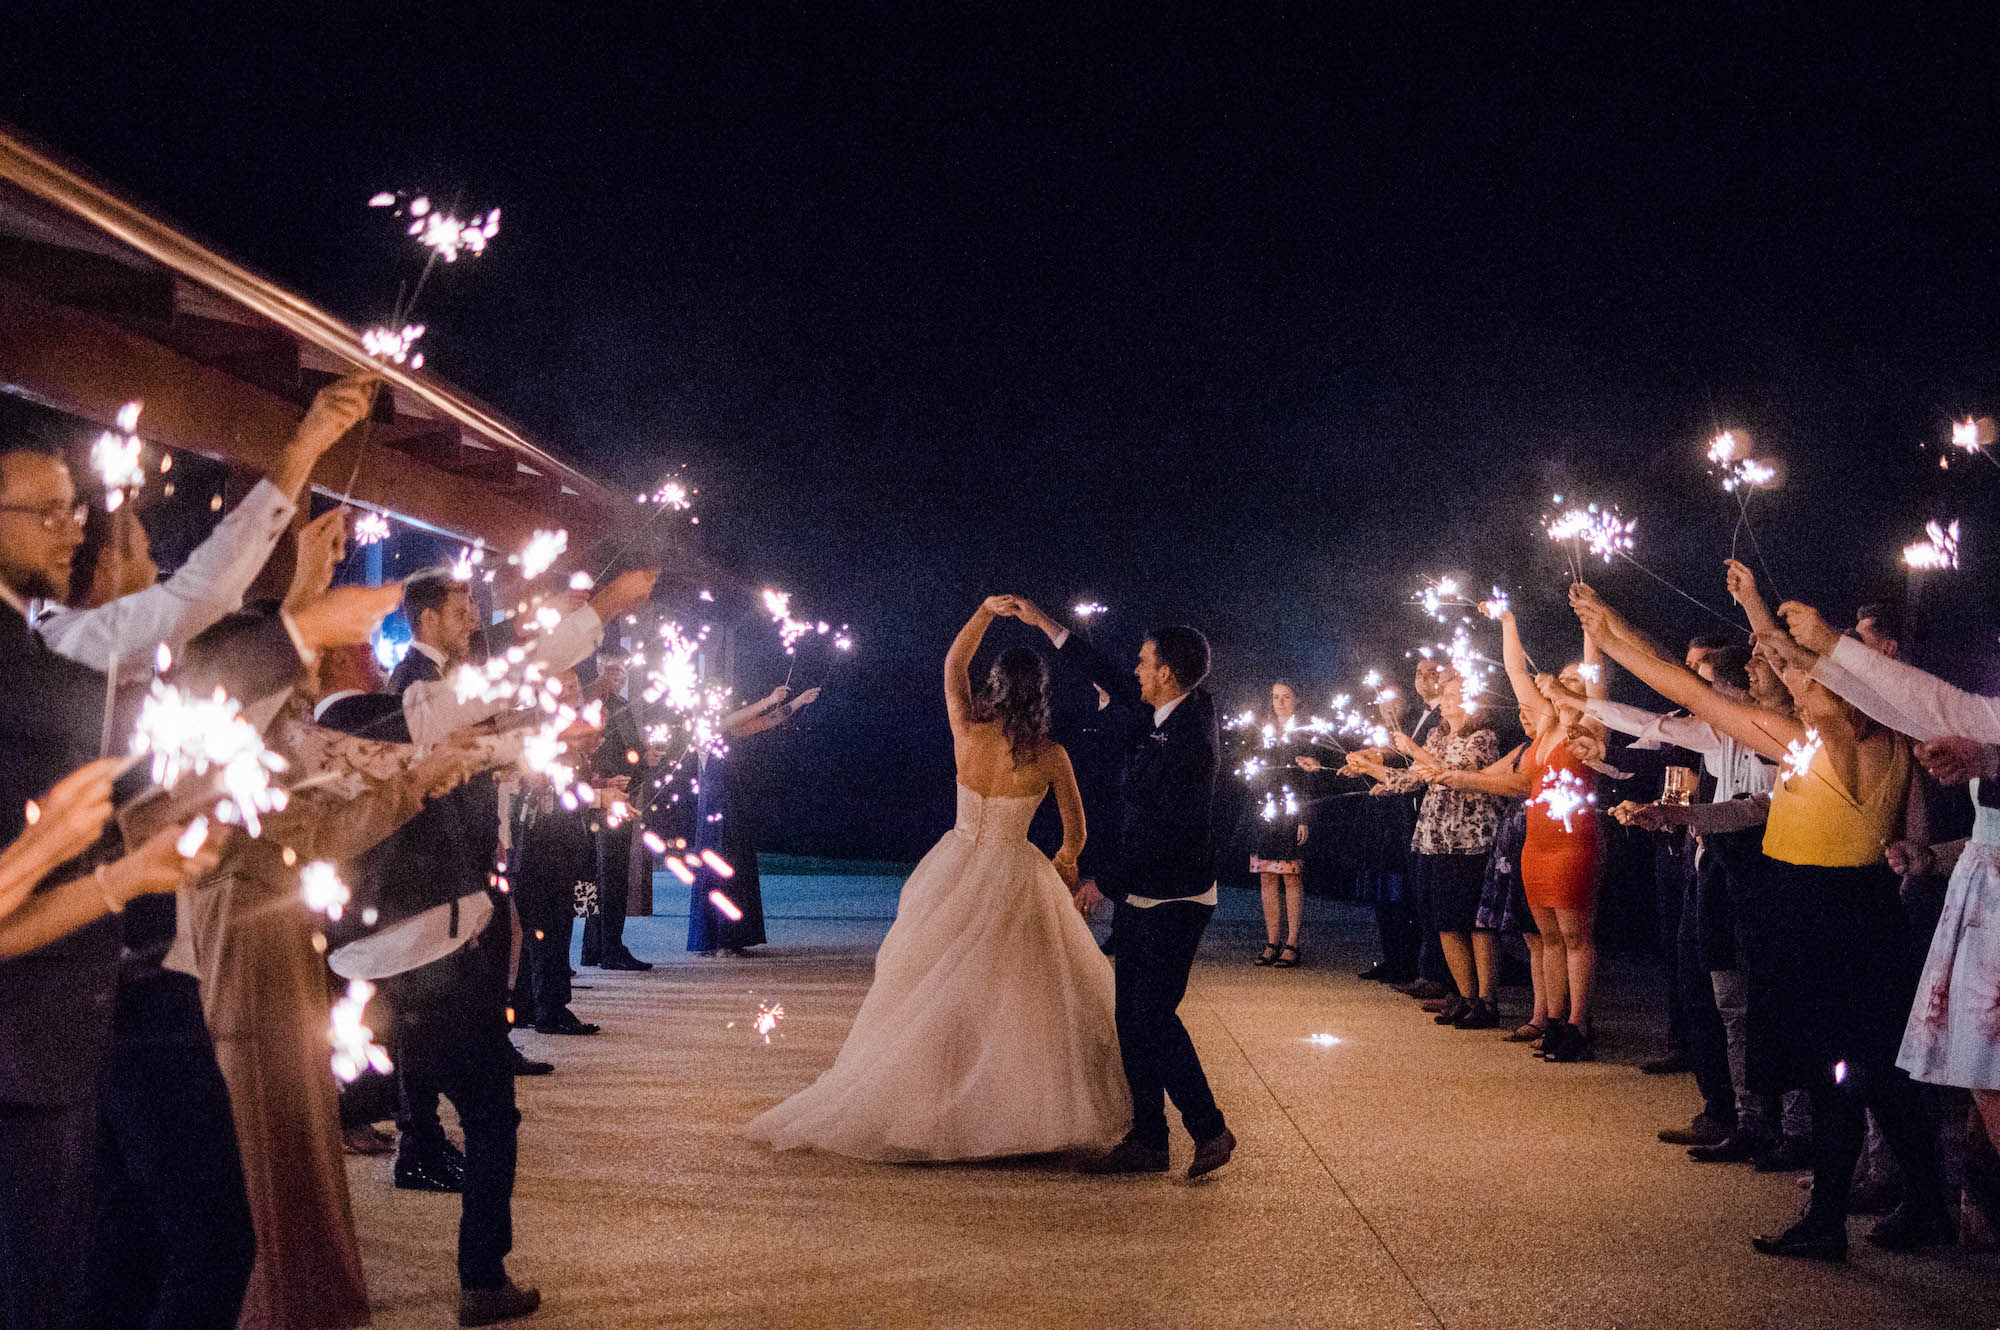 The groom dances with the bride as they do a sparkler exit at Quarry Farm, Australia.